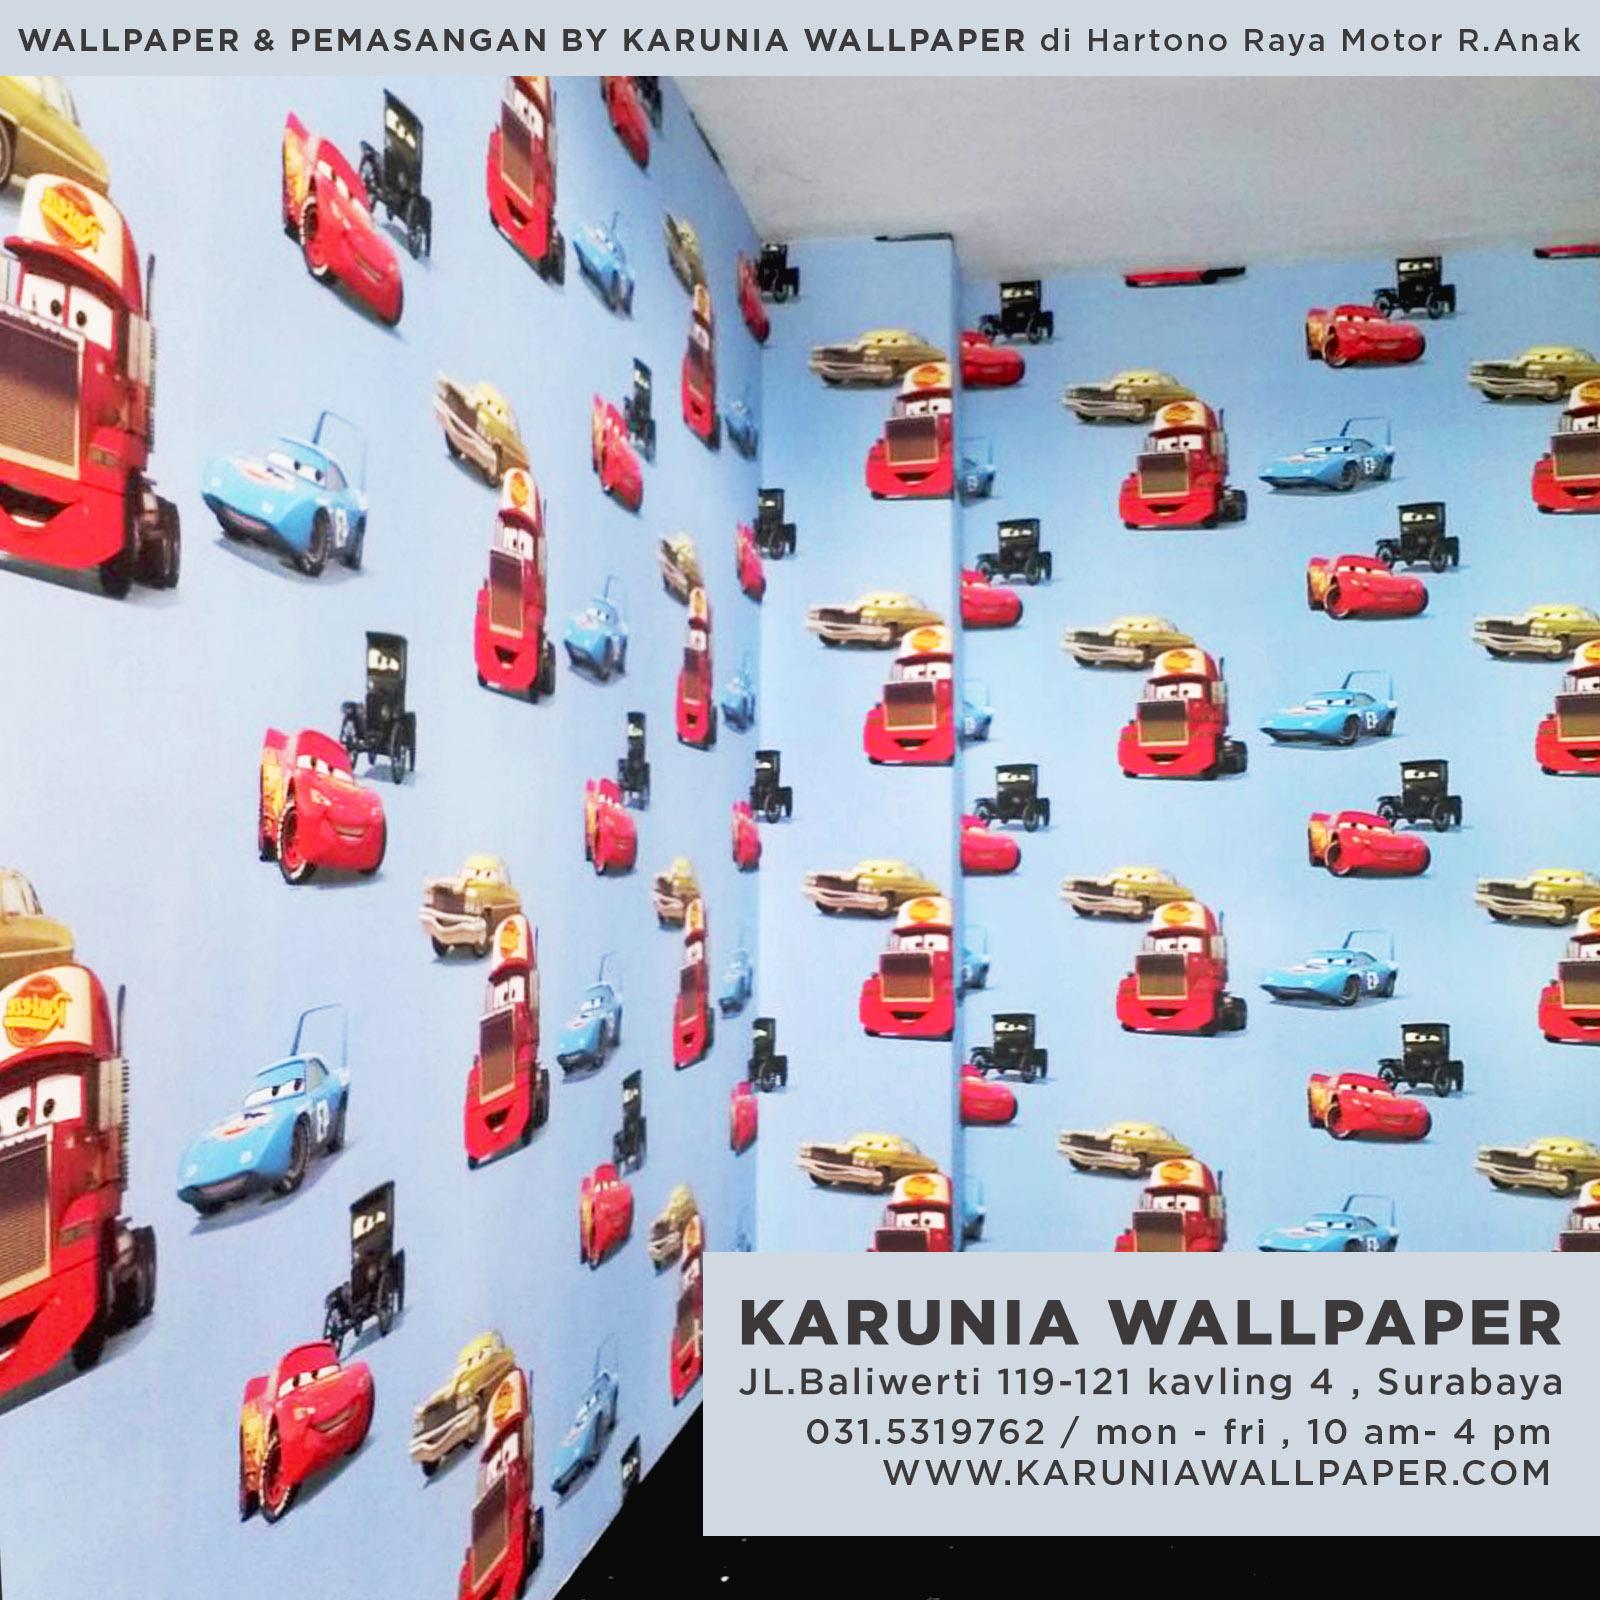 pemasangan wallpaper surabaya toko karuniawallpaper